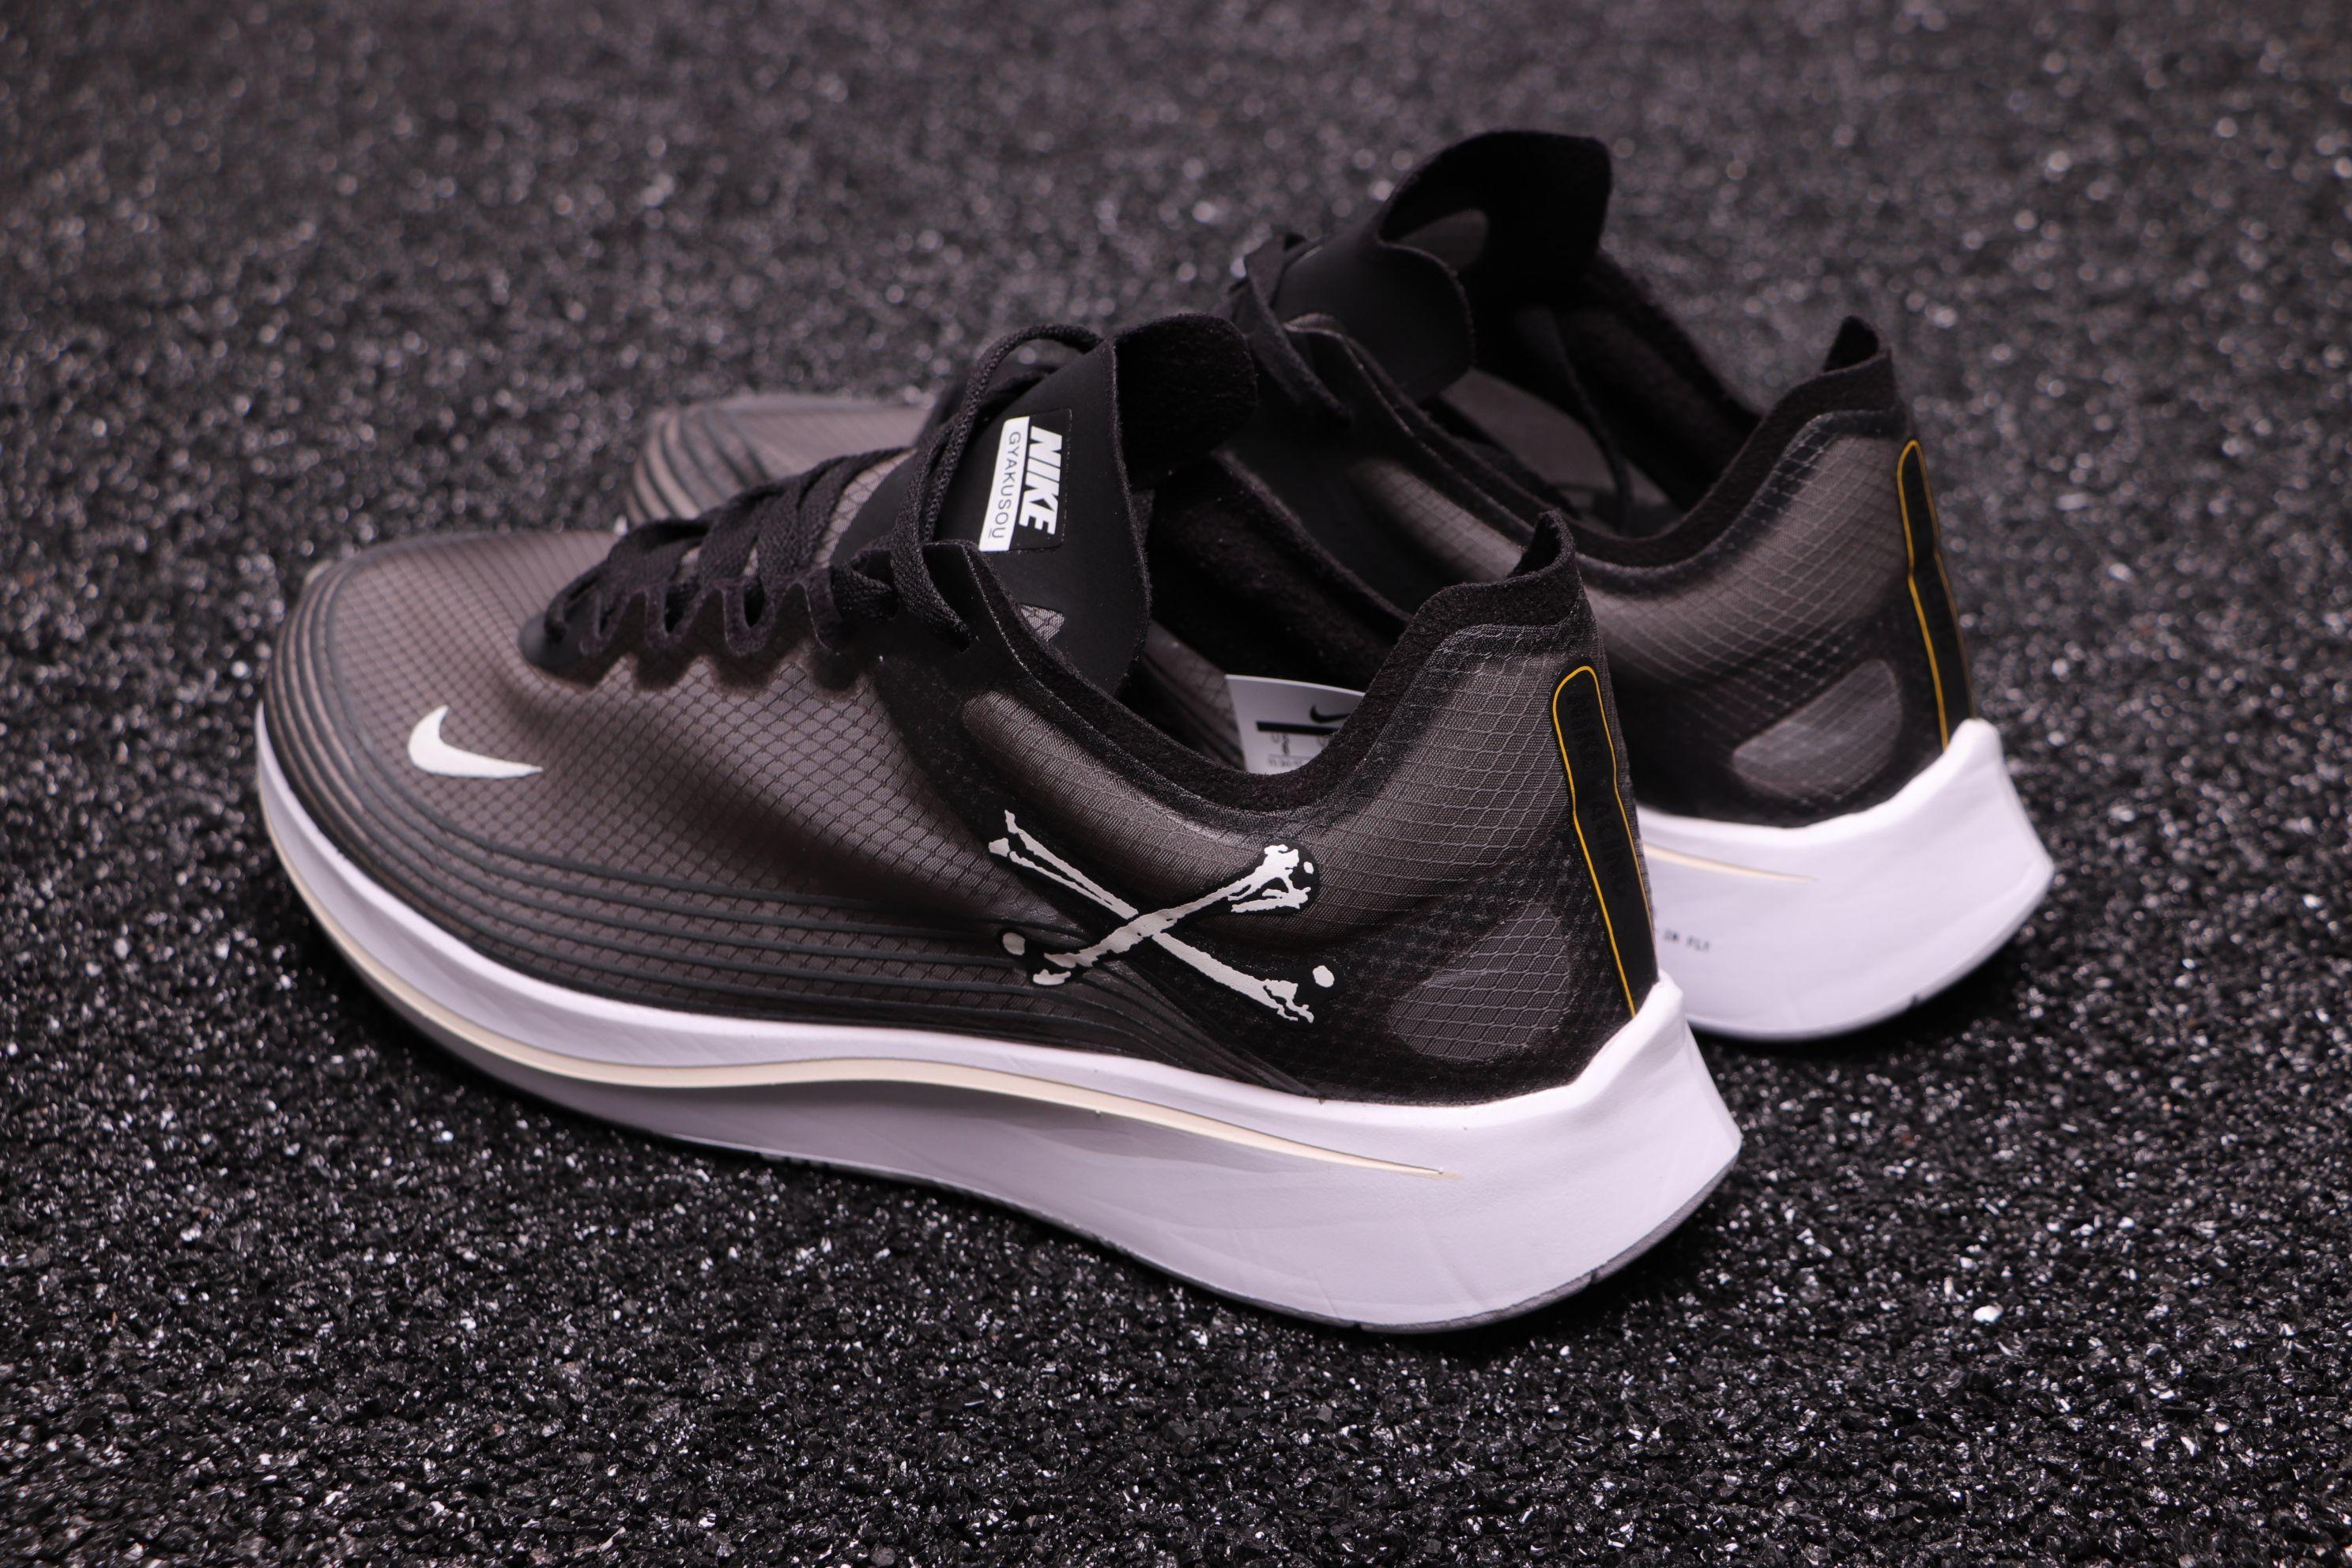 77fcde1d8a3 Undercover Gyakusou x Nike Zoom Fly SP Crossbones Black